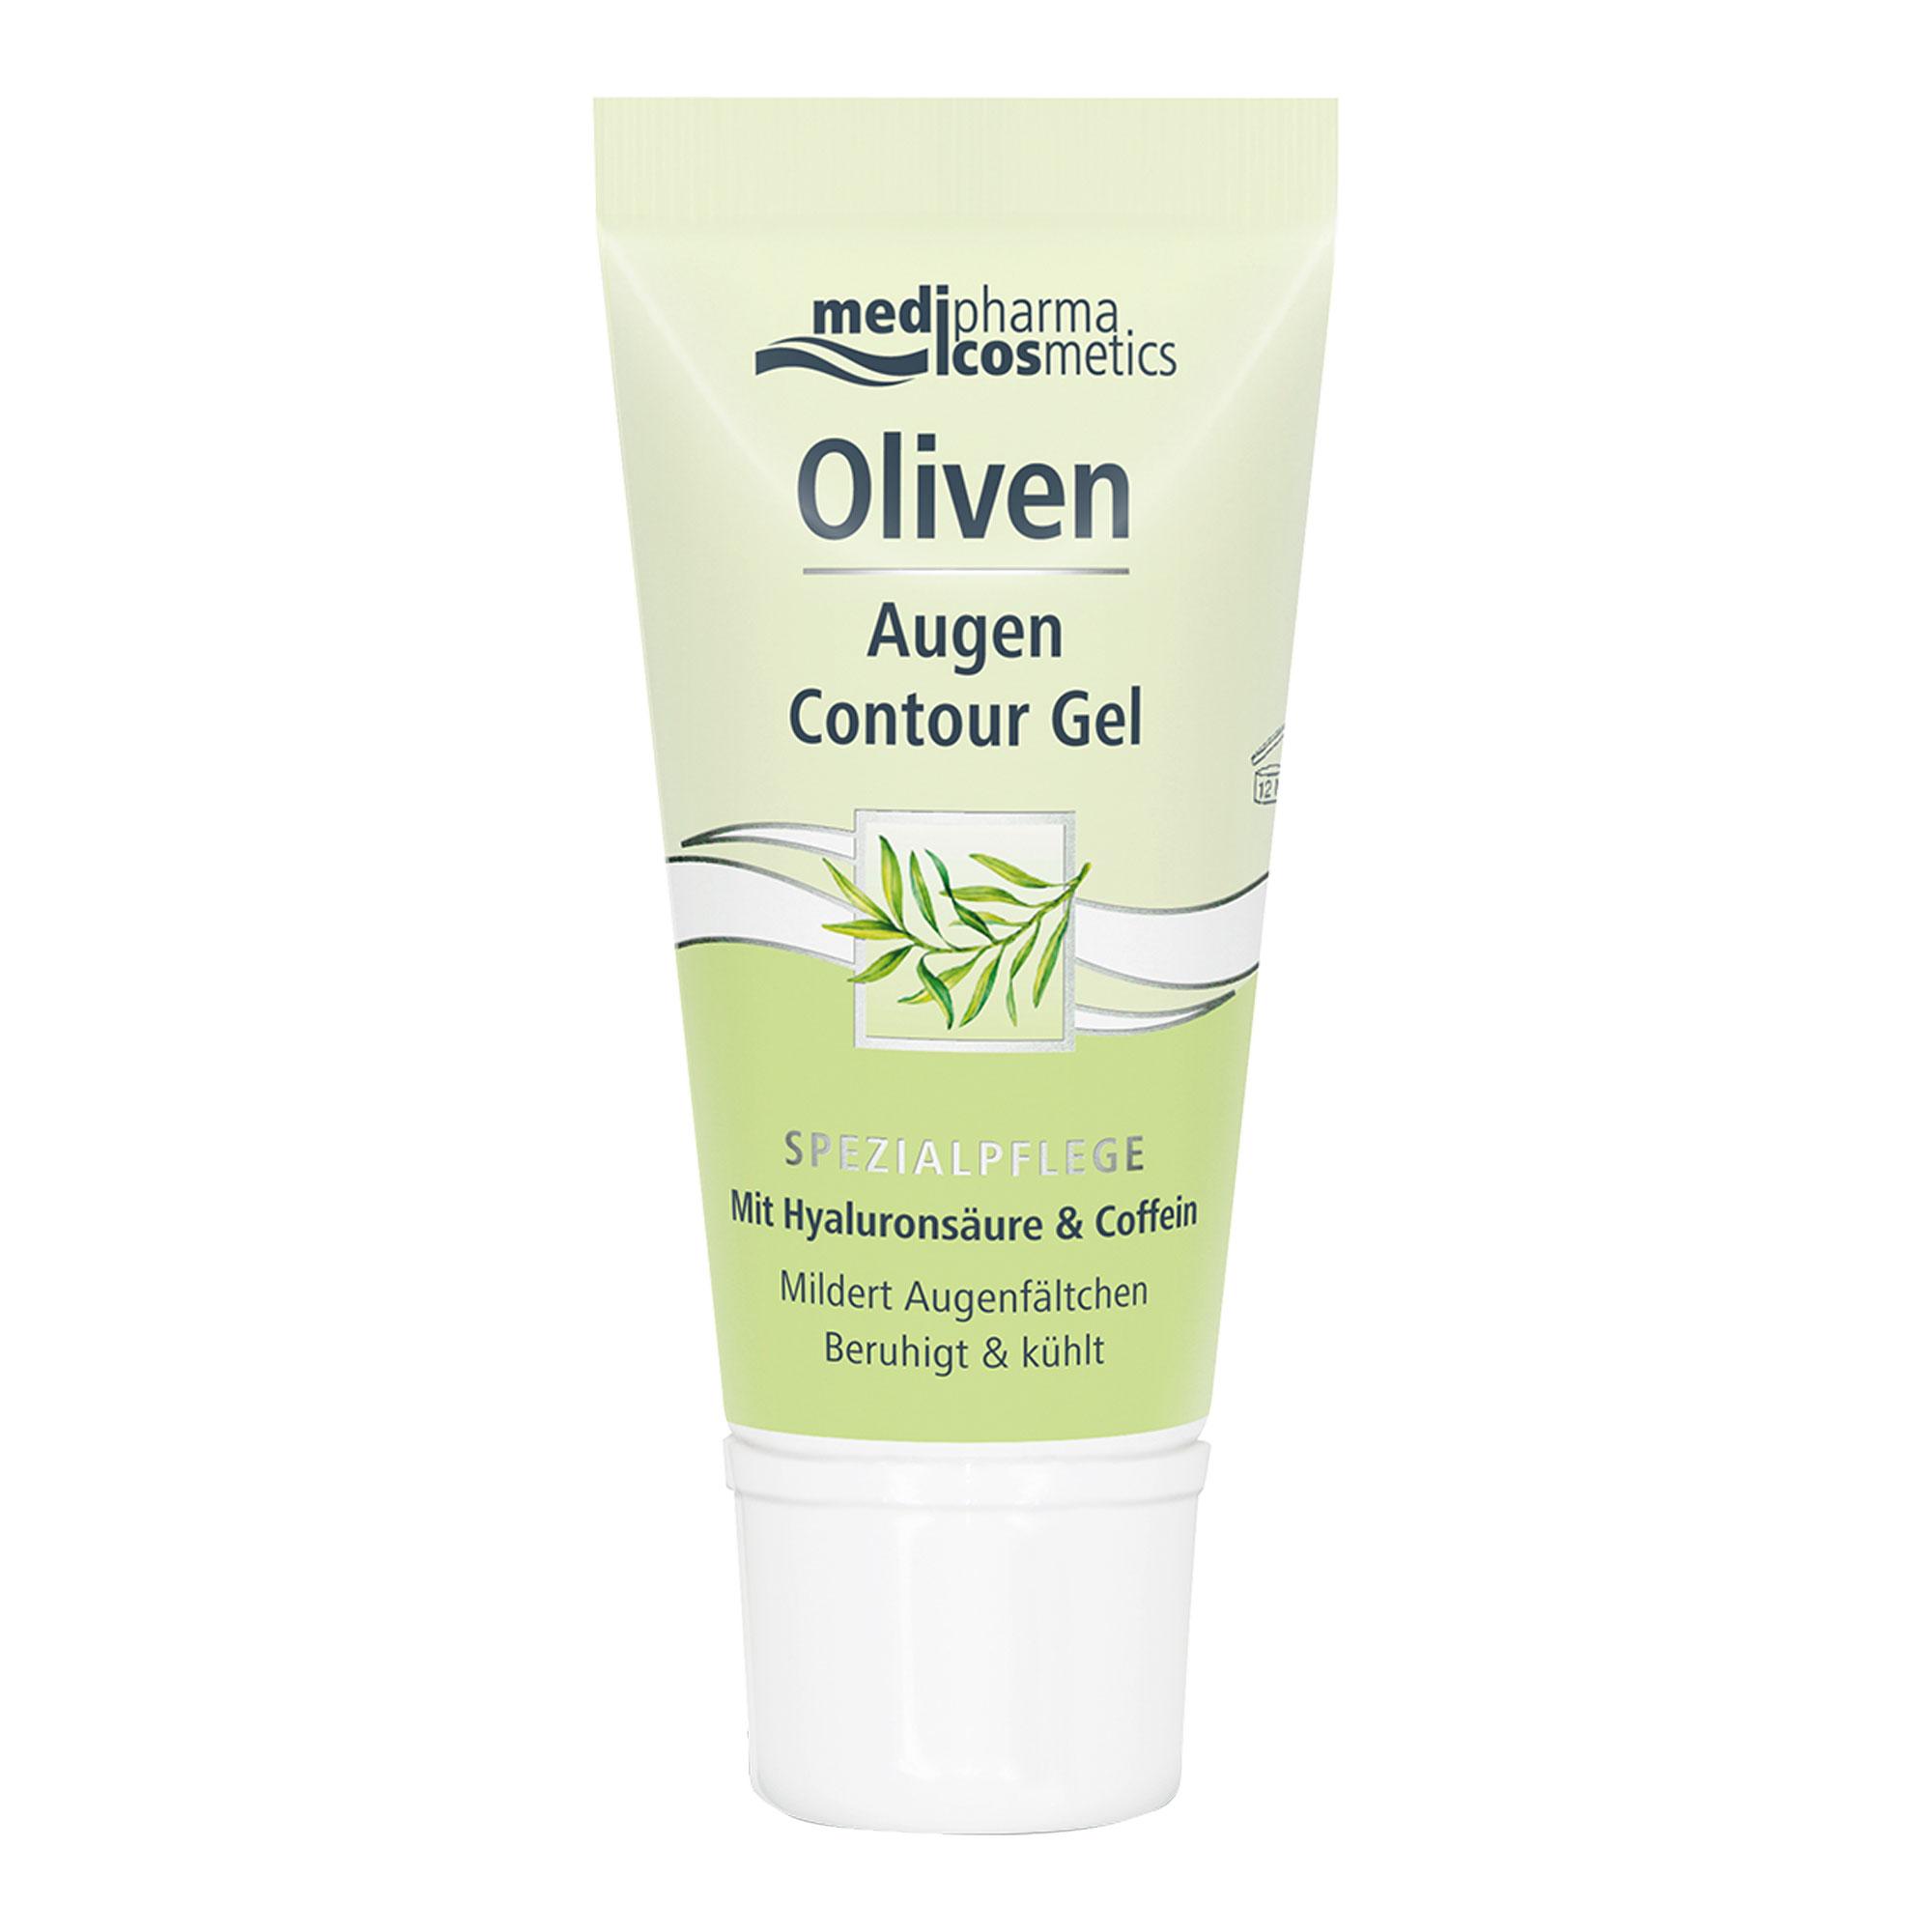 Olivenöl Augen Contour Gel